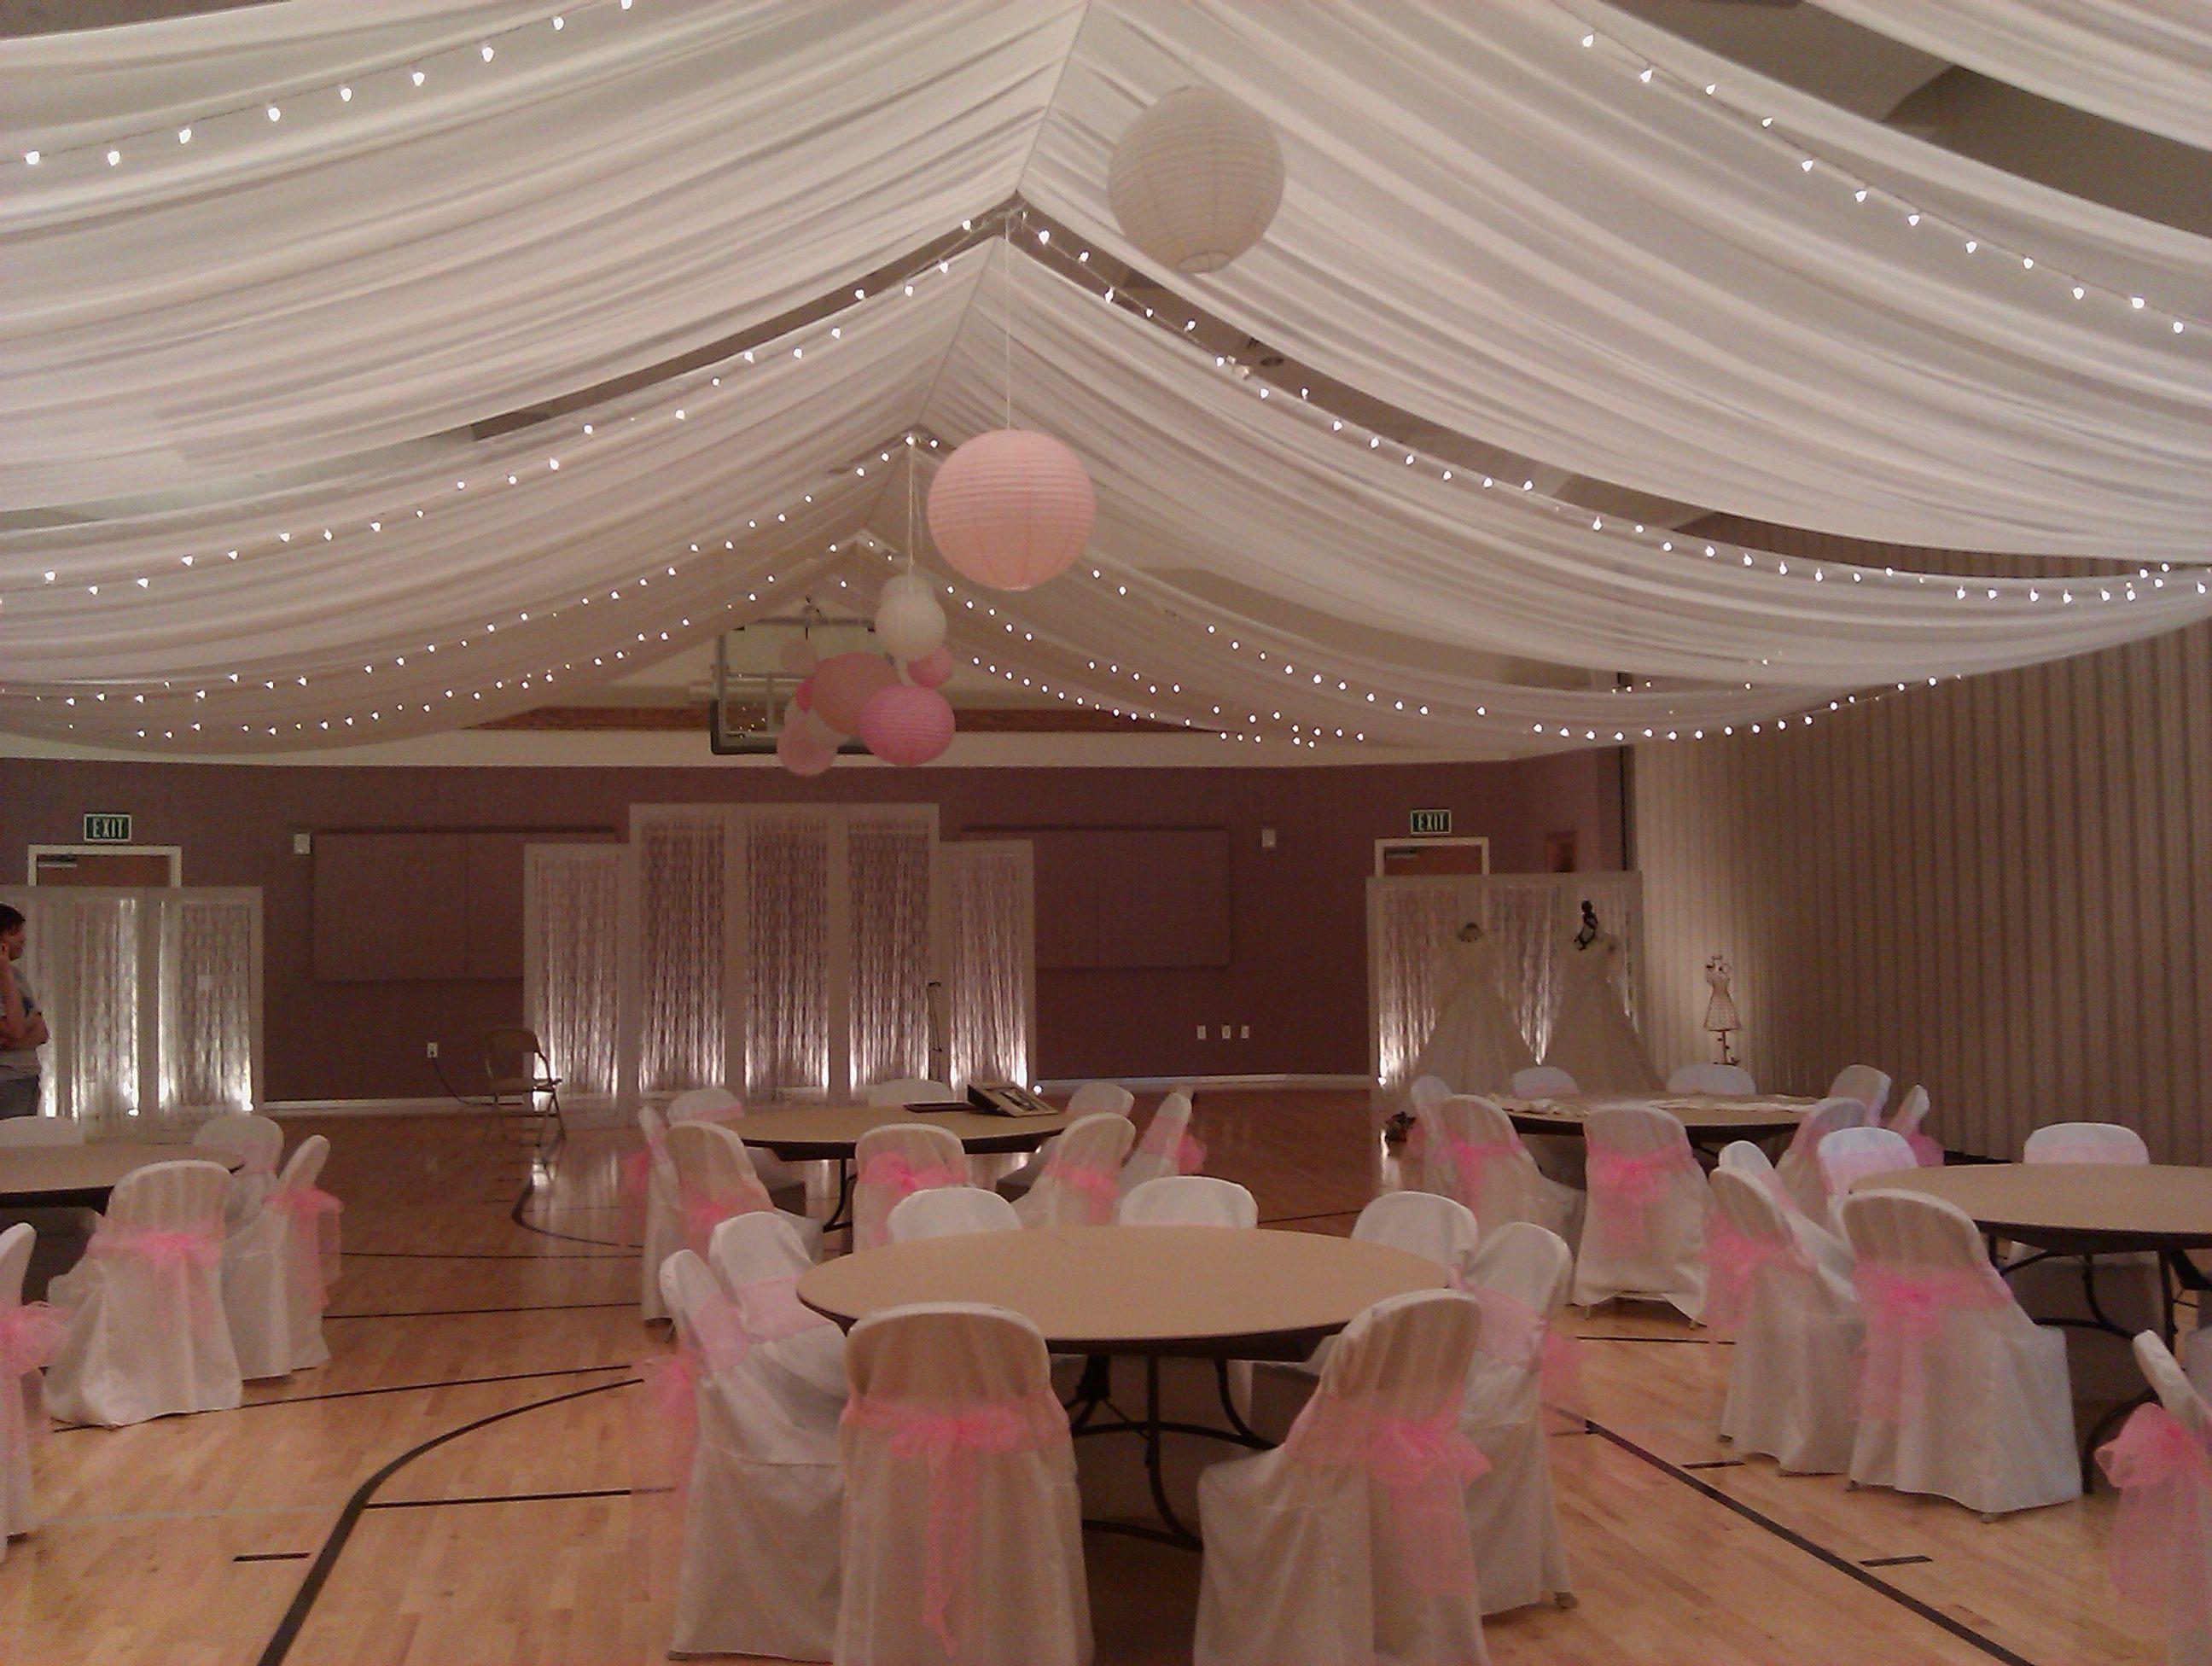 Wedding ceiling decorations set : Wedding ceiling ogden utah decor